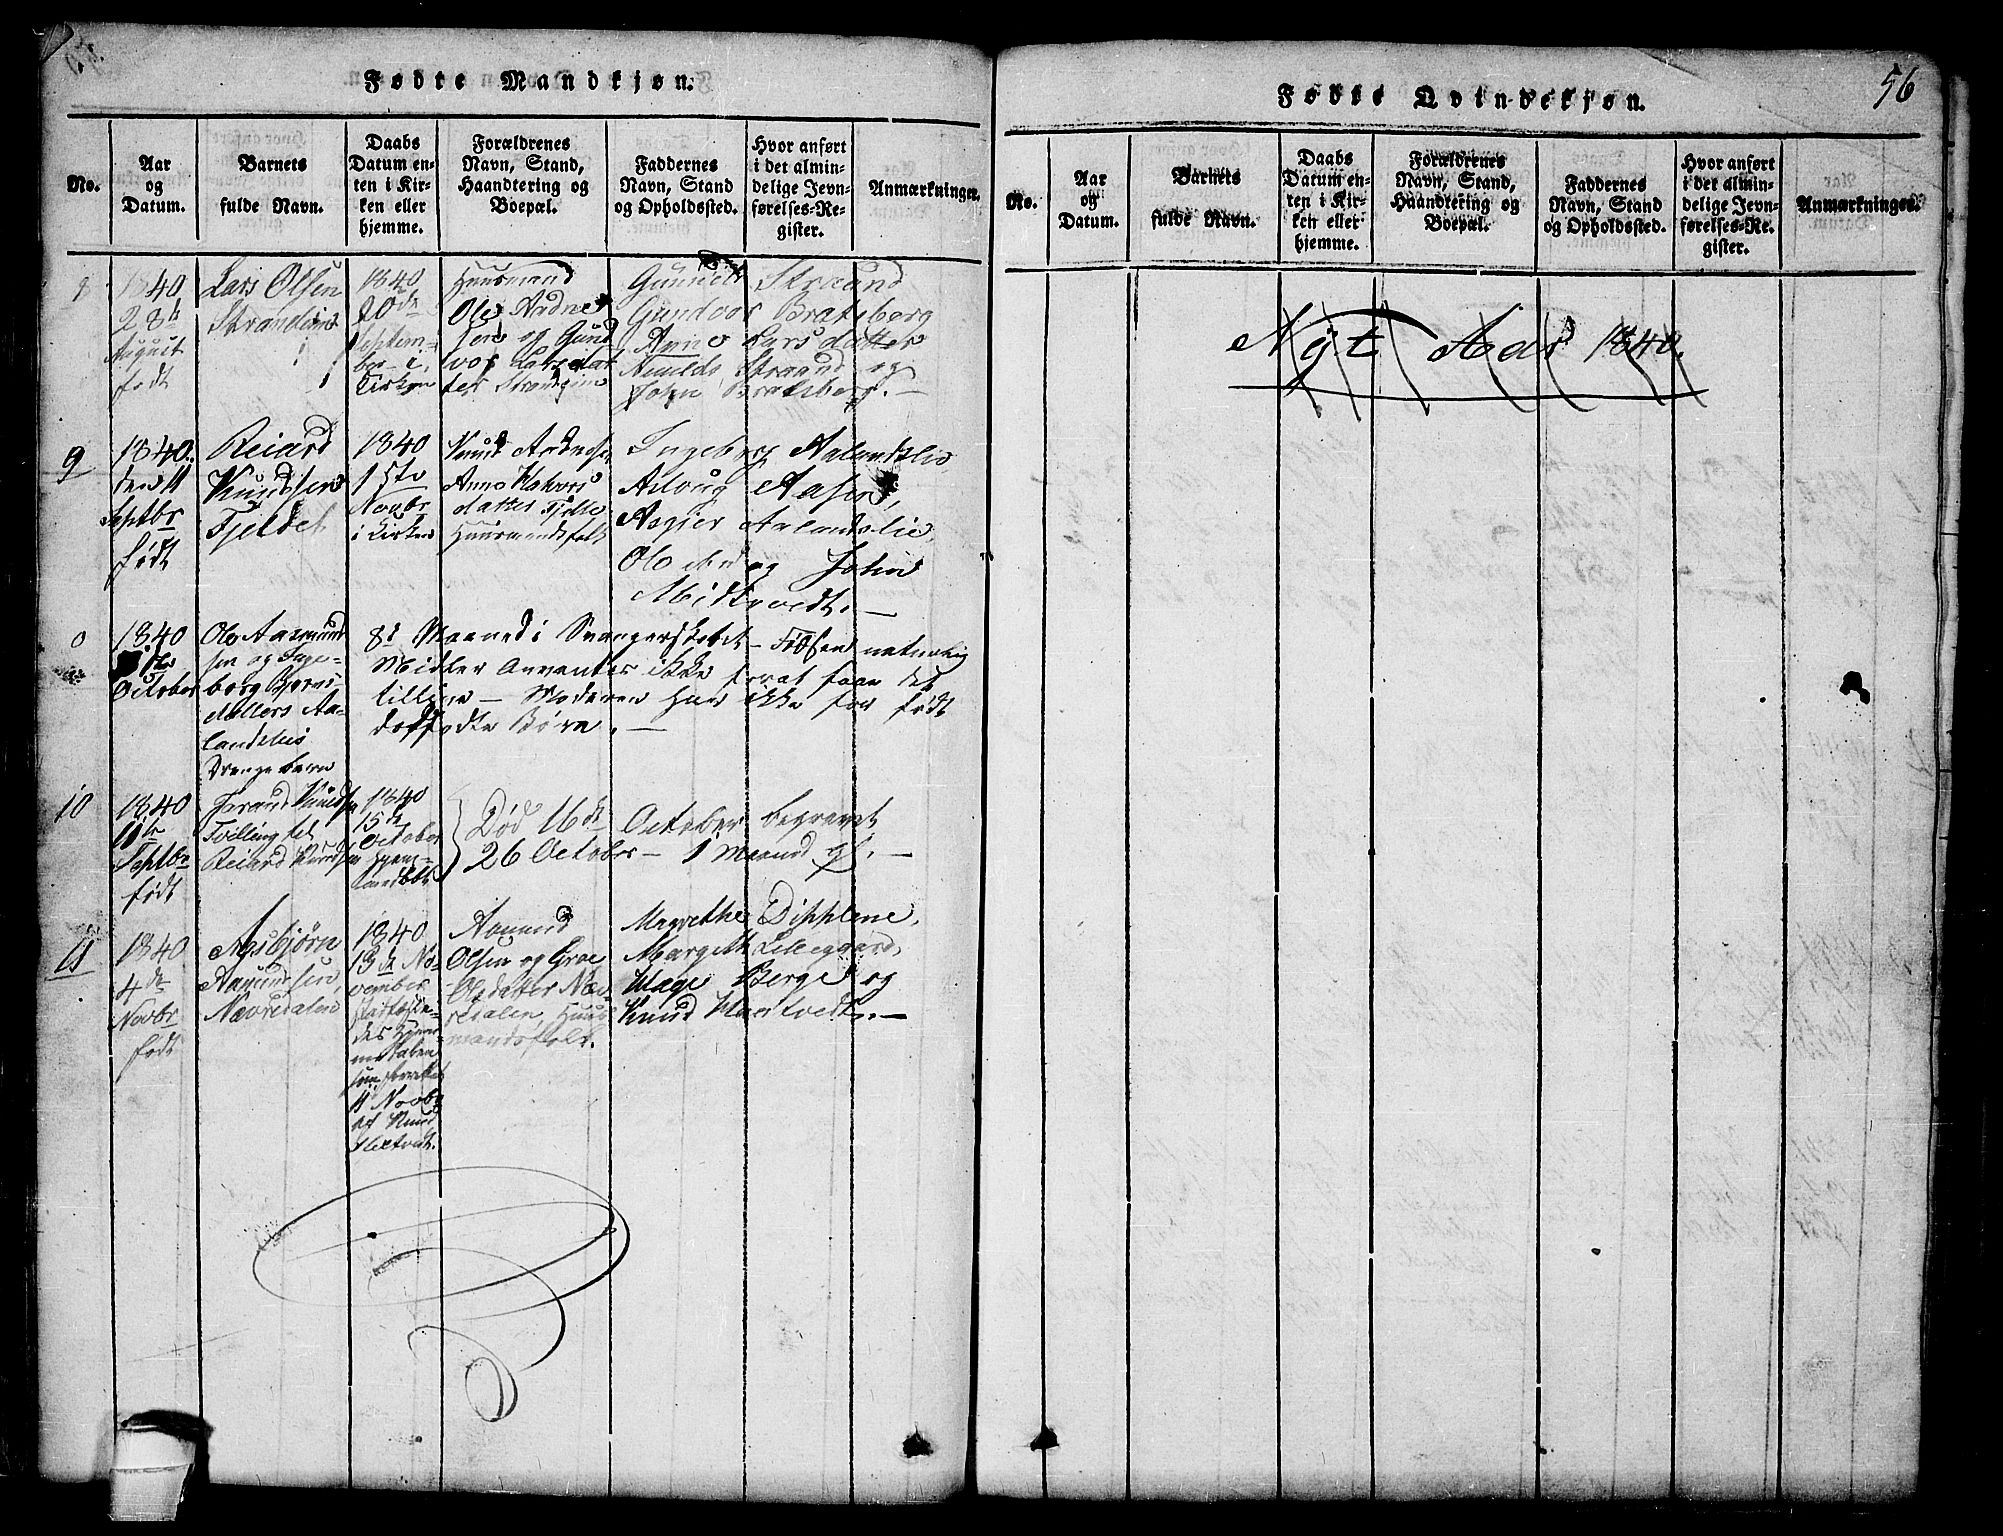 SAKO, Lårdal kirkebøker, G/Ga/L0001: Klokkerbok nr. I 1, 1815-1861, s. 56